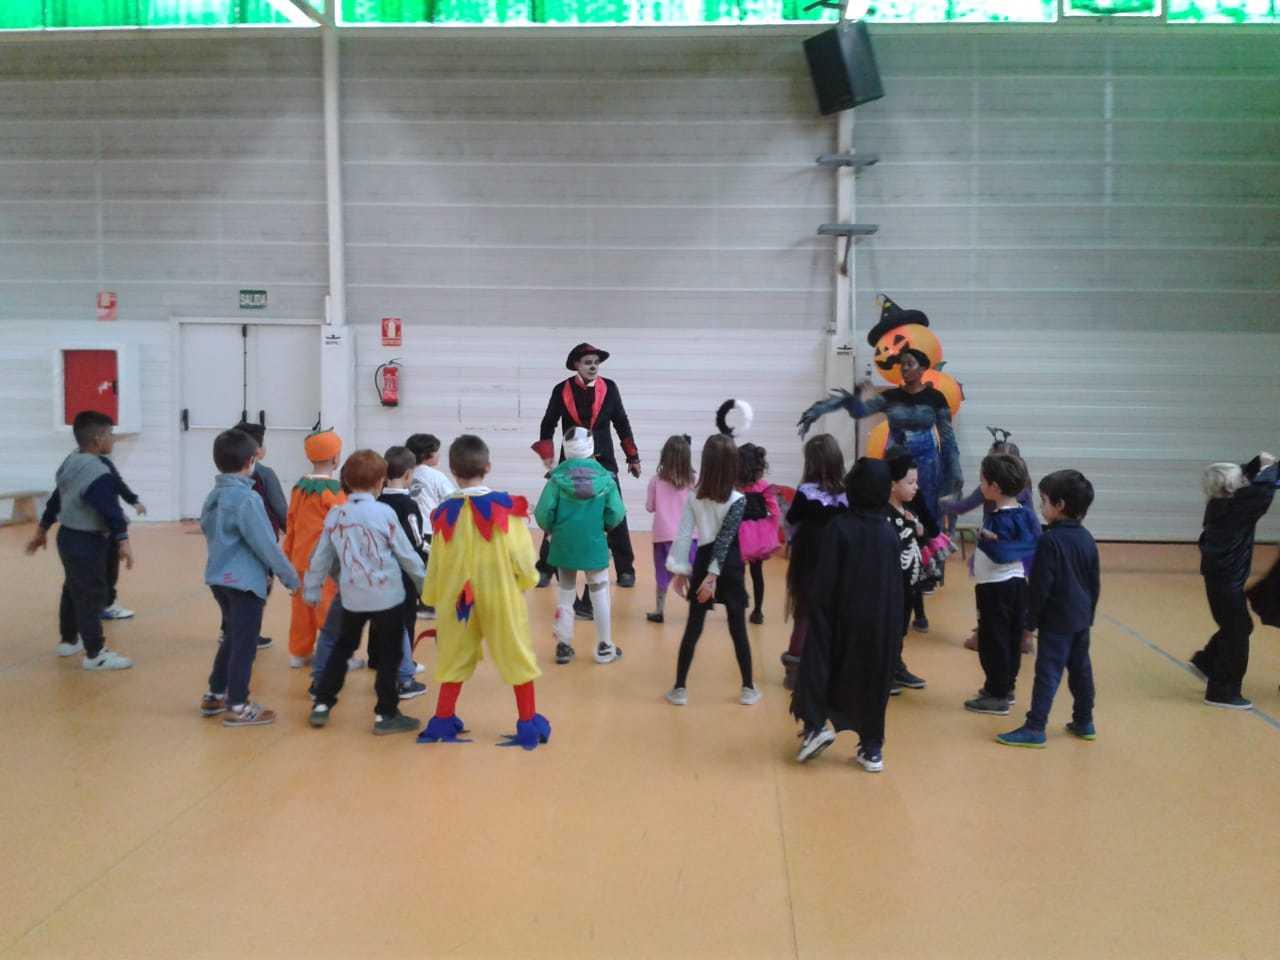 2018_10_31_1º disfruta terrorificamente en Halloween_CEIP FDLR_Las Rozas 38